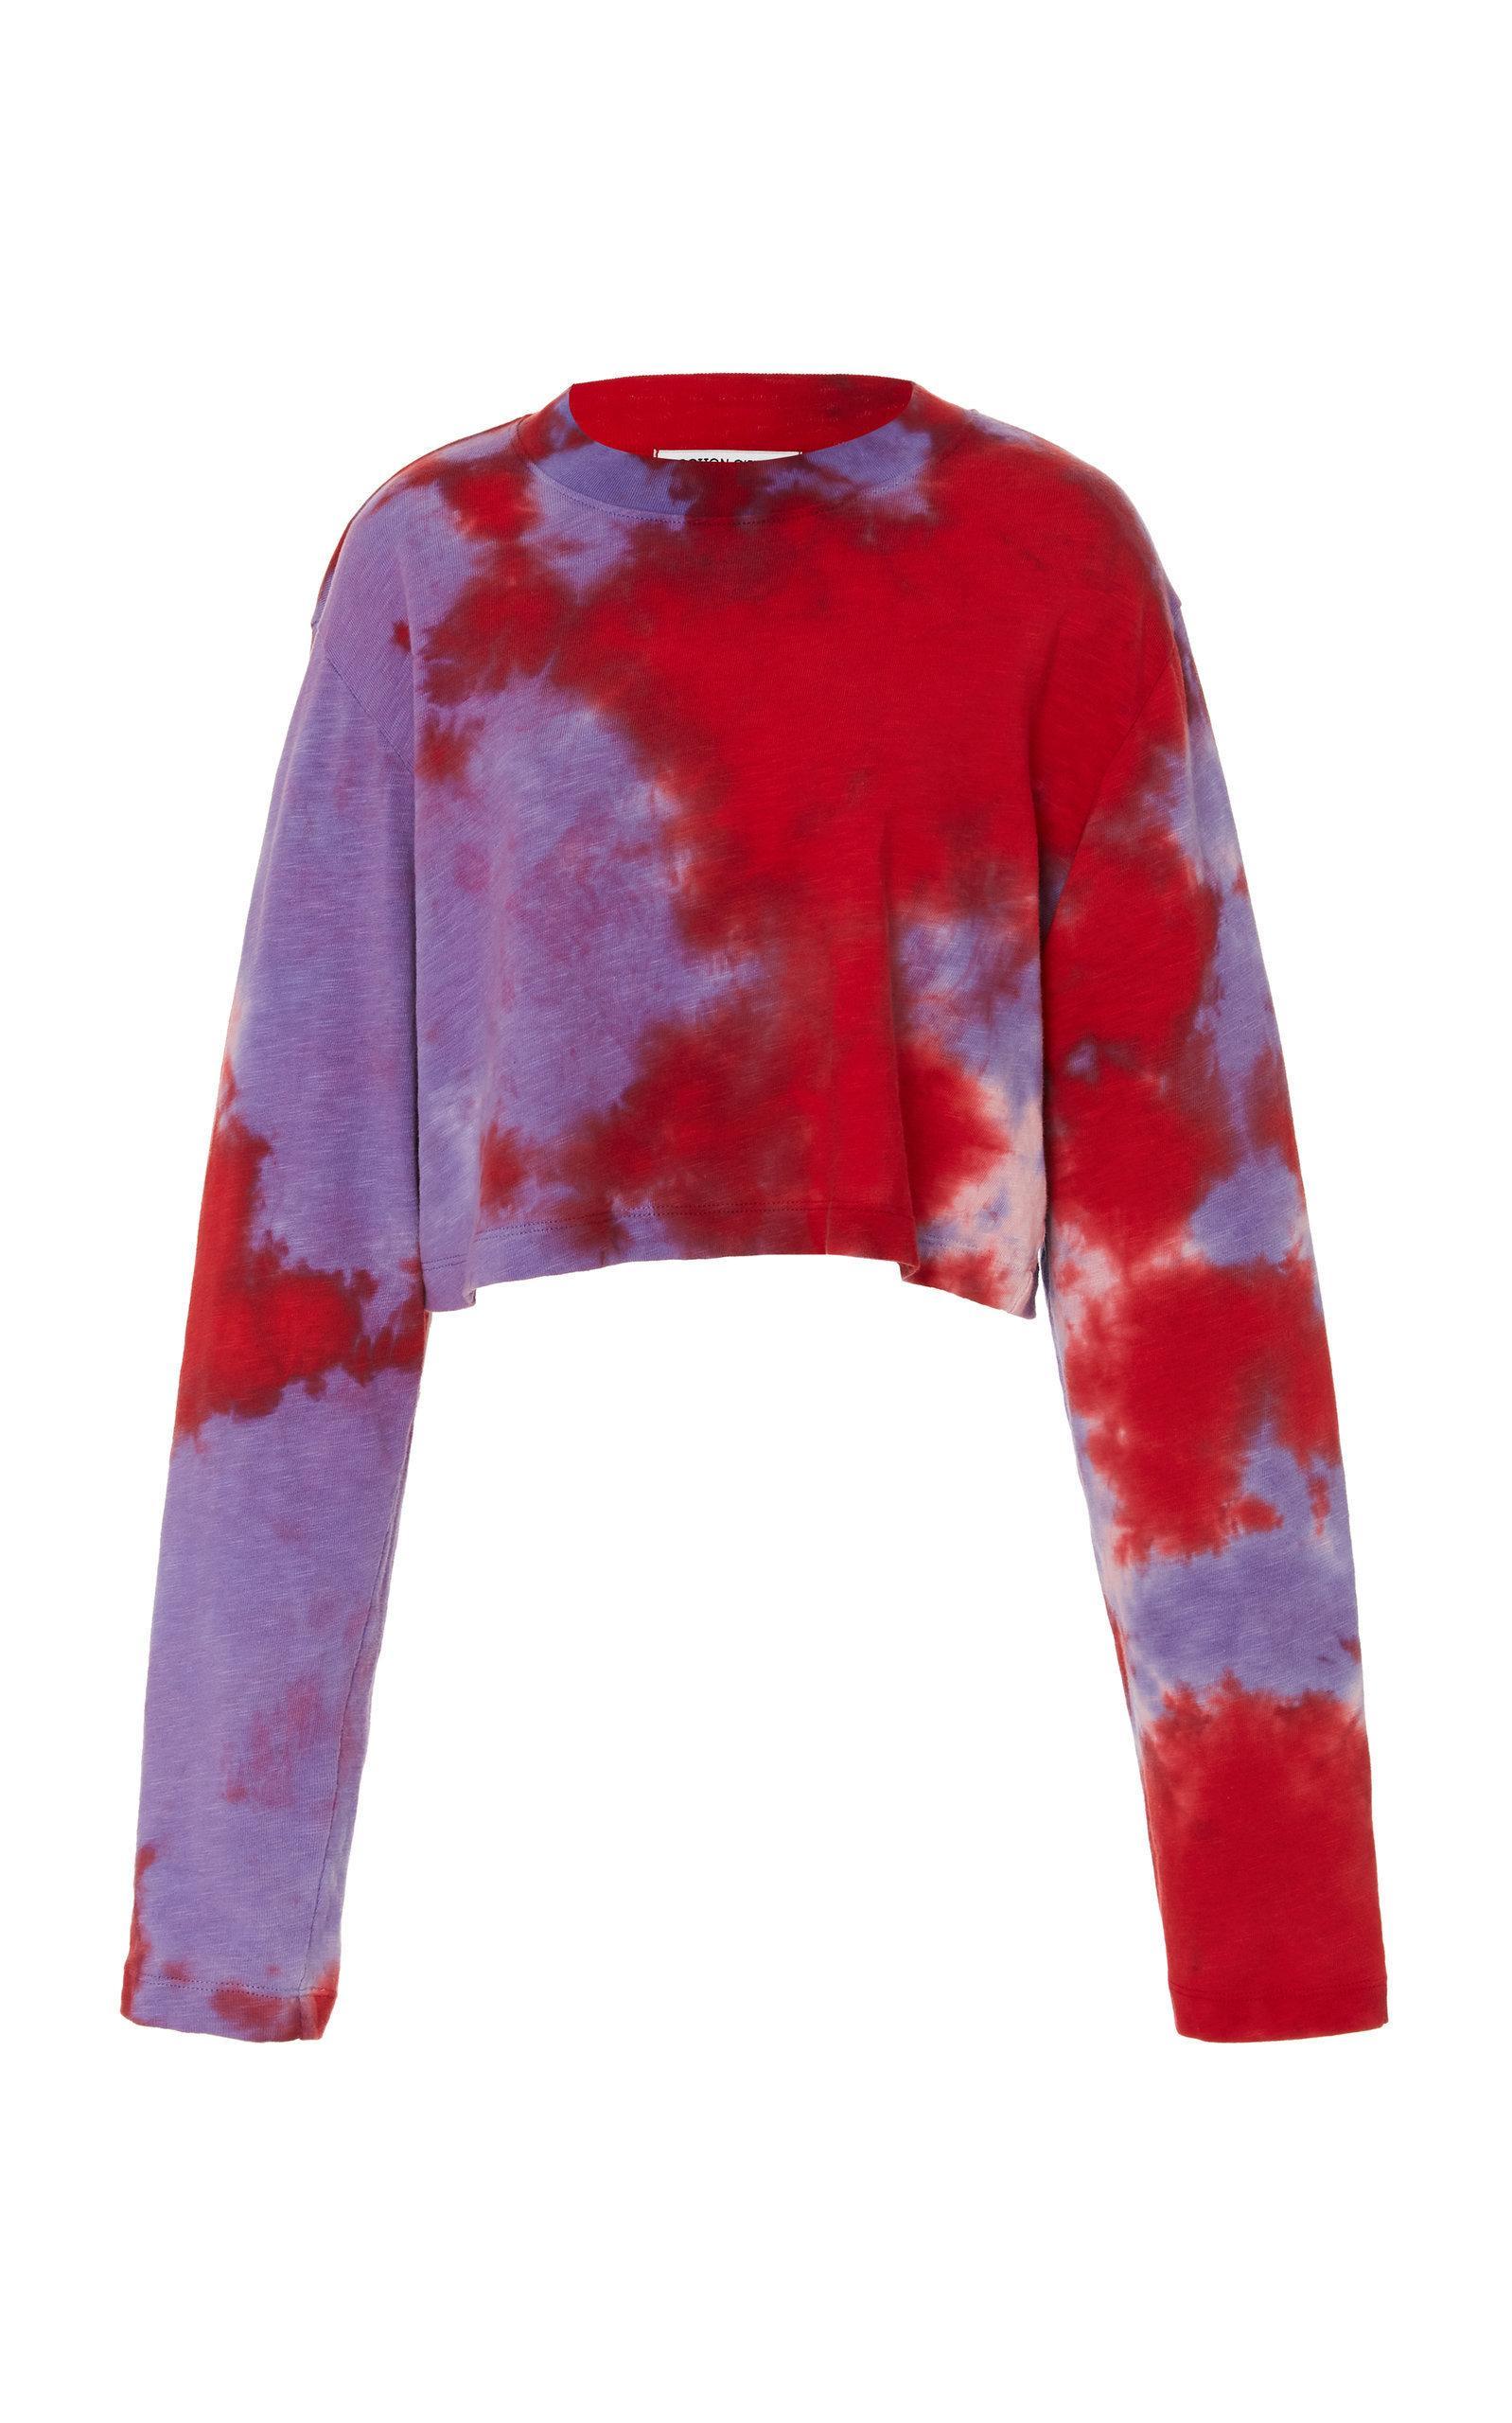 6819fa8c8dd Cotton Citizen Tokyo Crop Long Sleeve Shirt In Cherry & Lavender Tie Dye